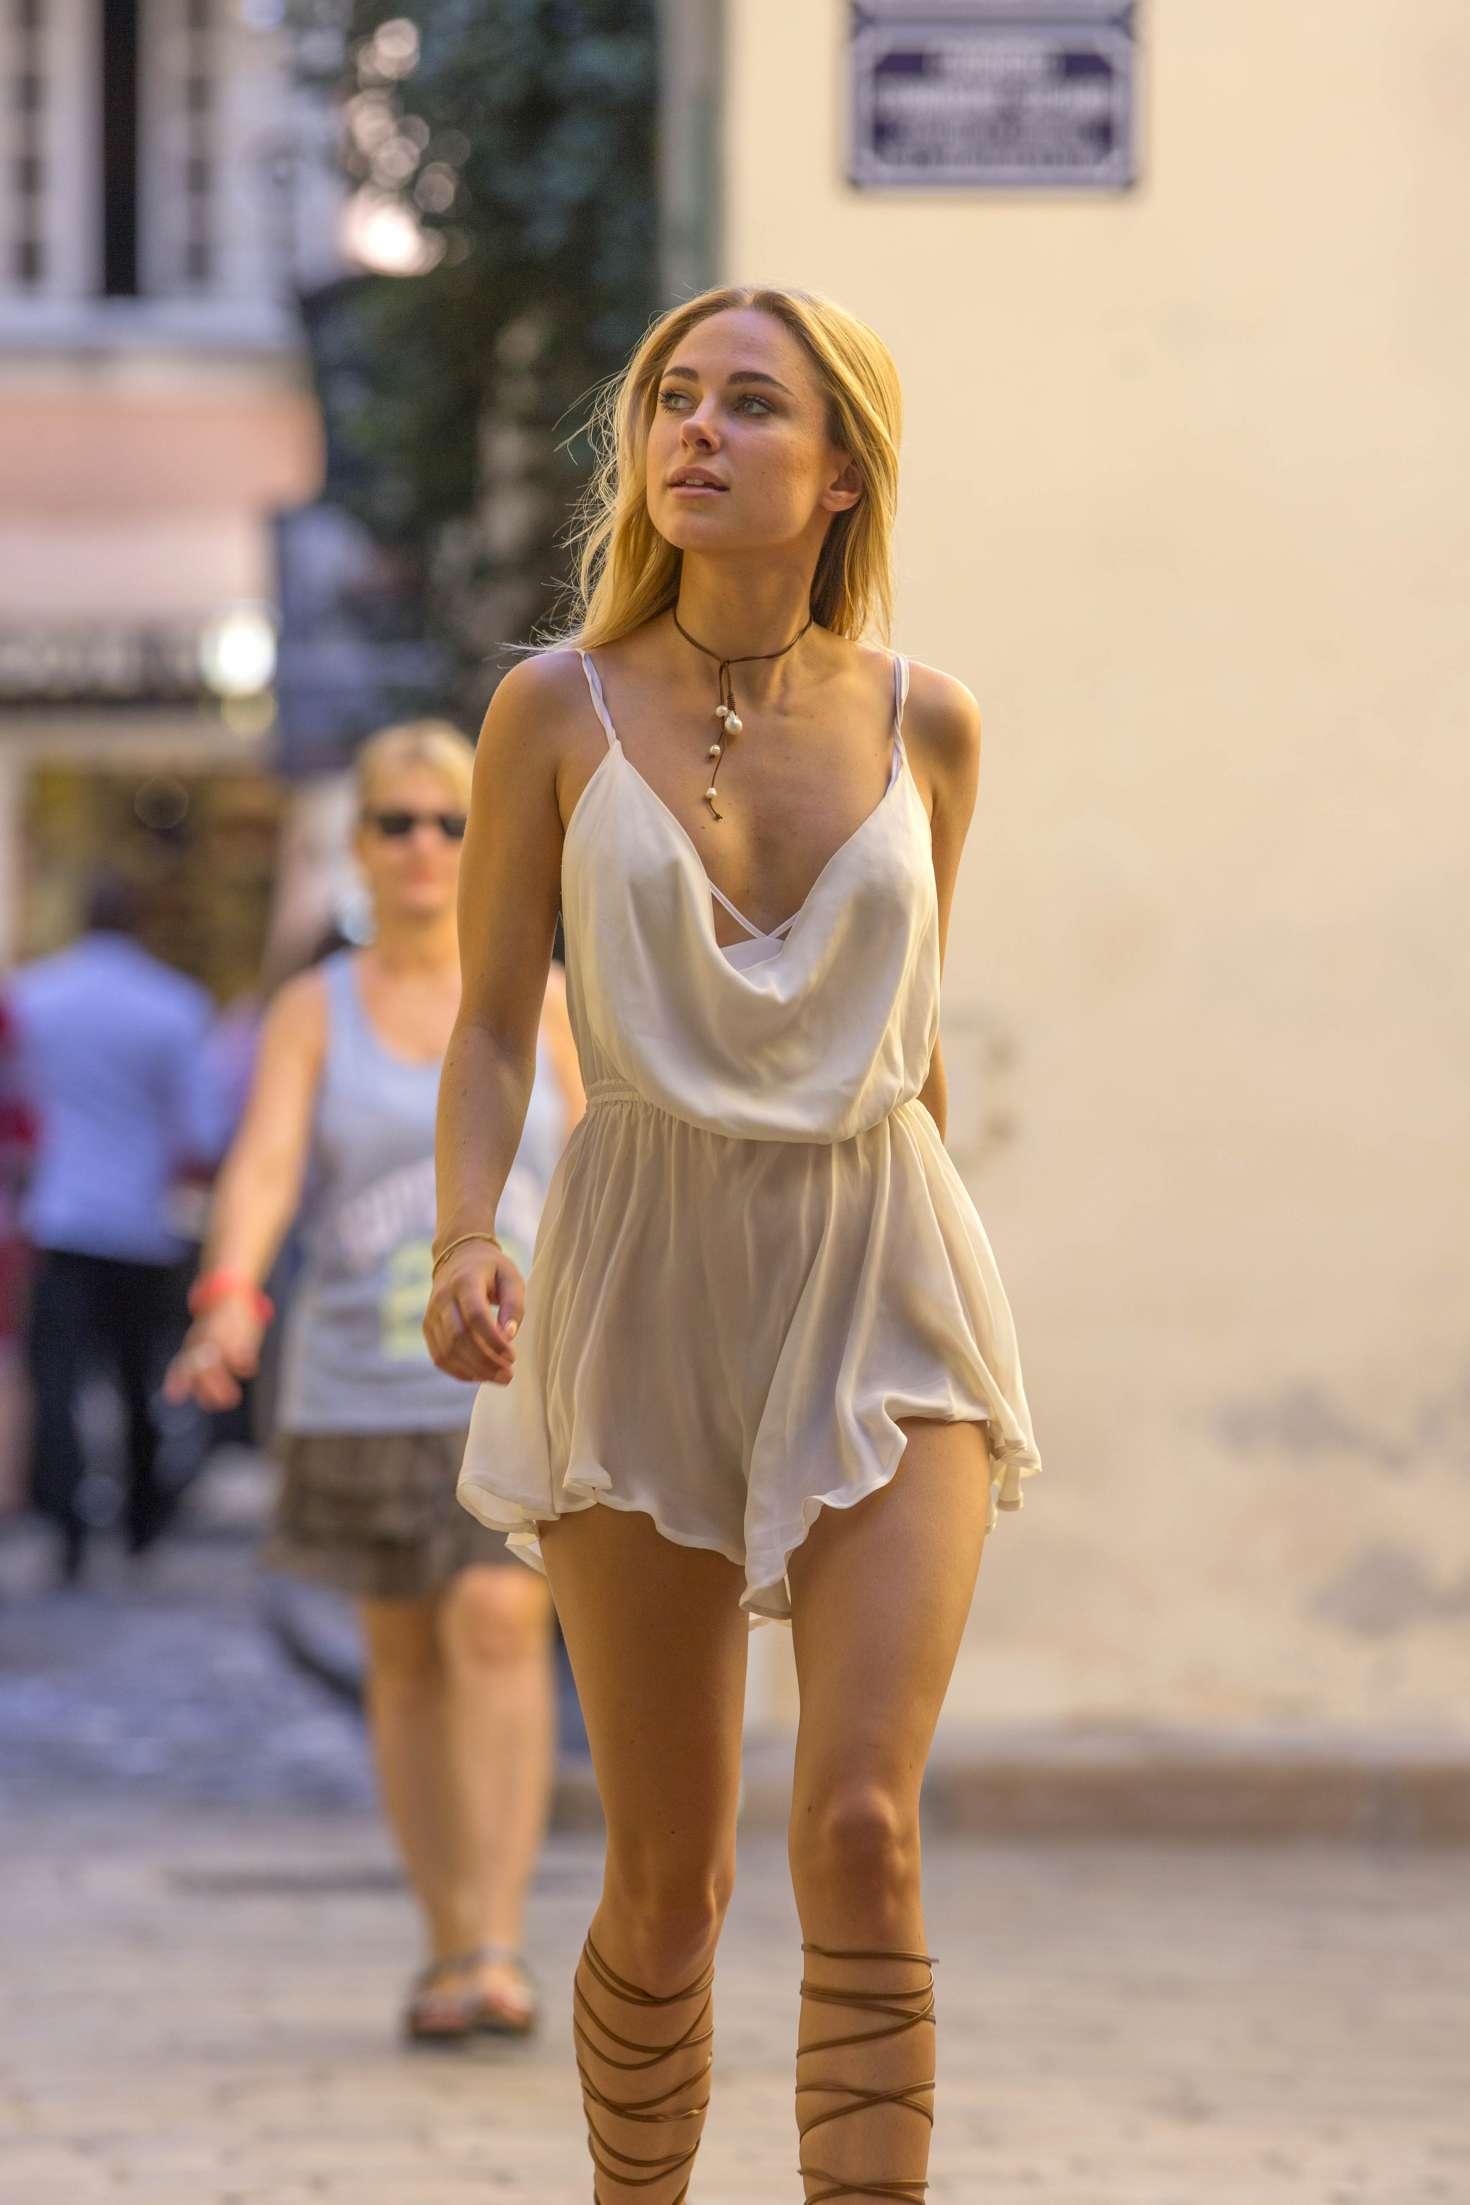 Gail porter nude